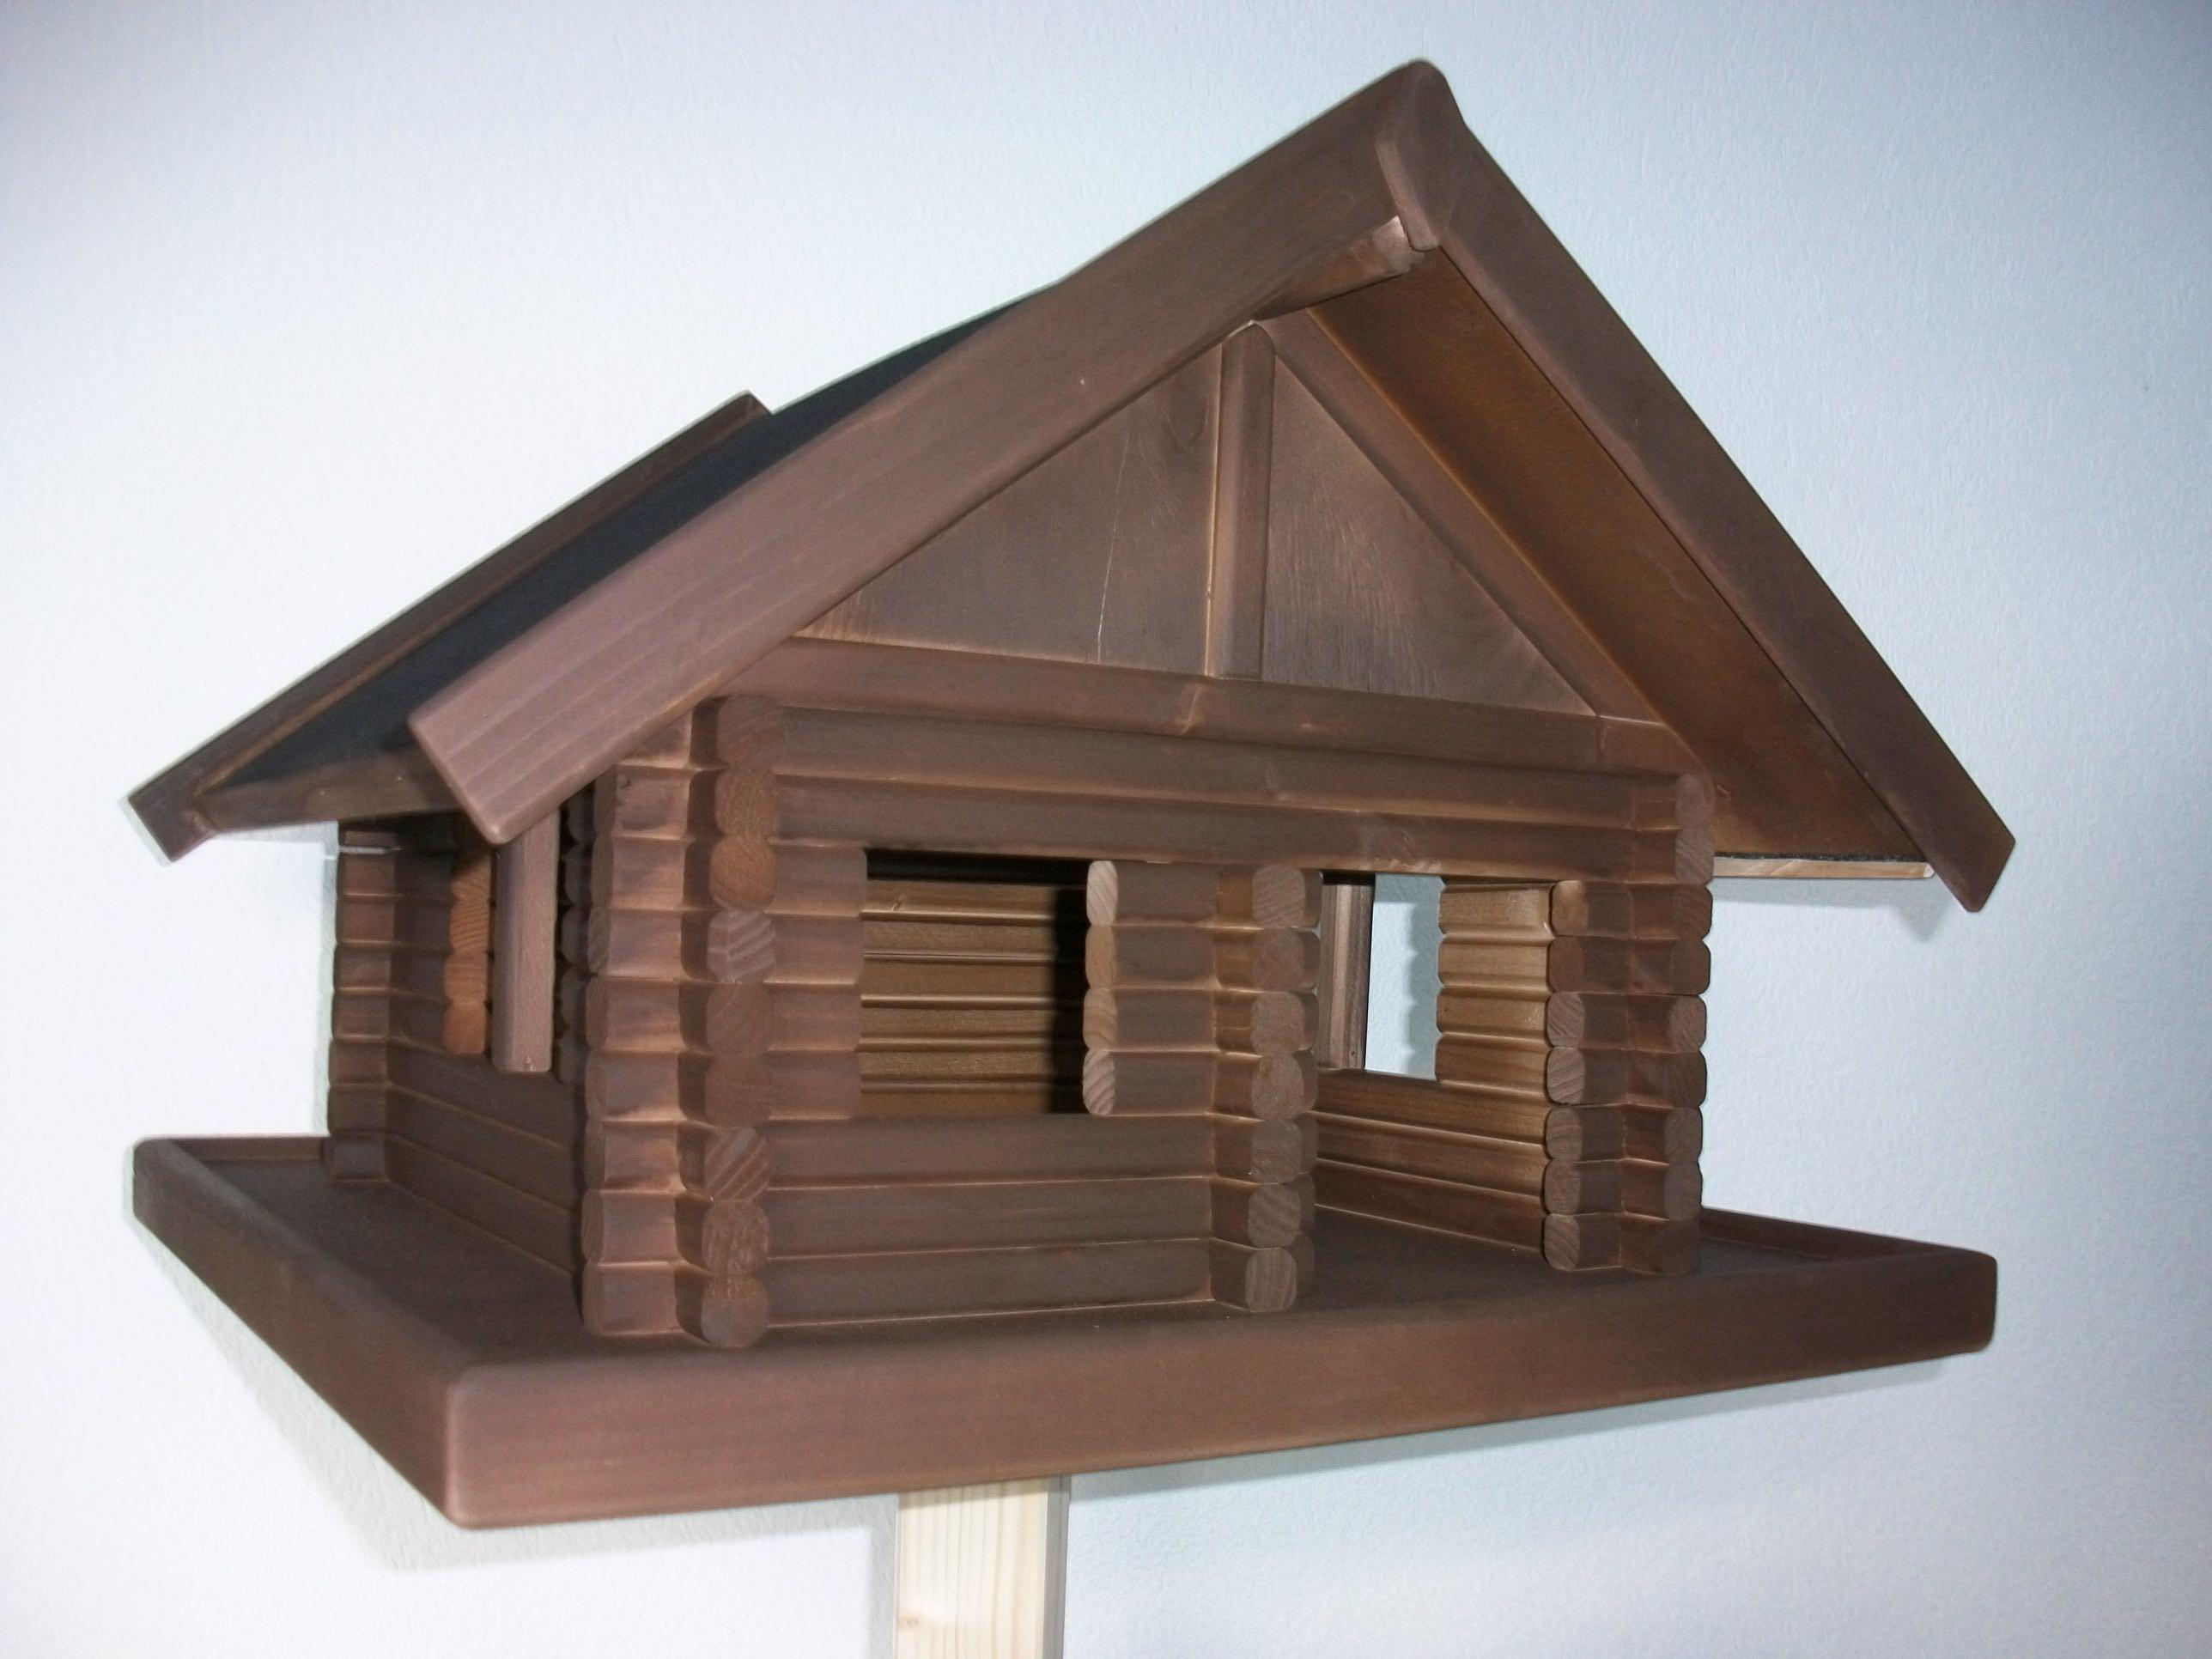 hundeh tten hundepavillons mini gartenh user. Black Bedroom Furniture Sets. Home Design Ideas